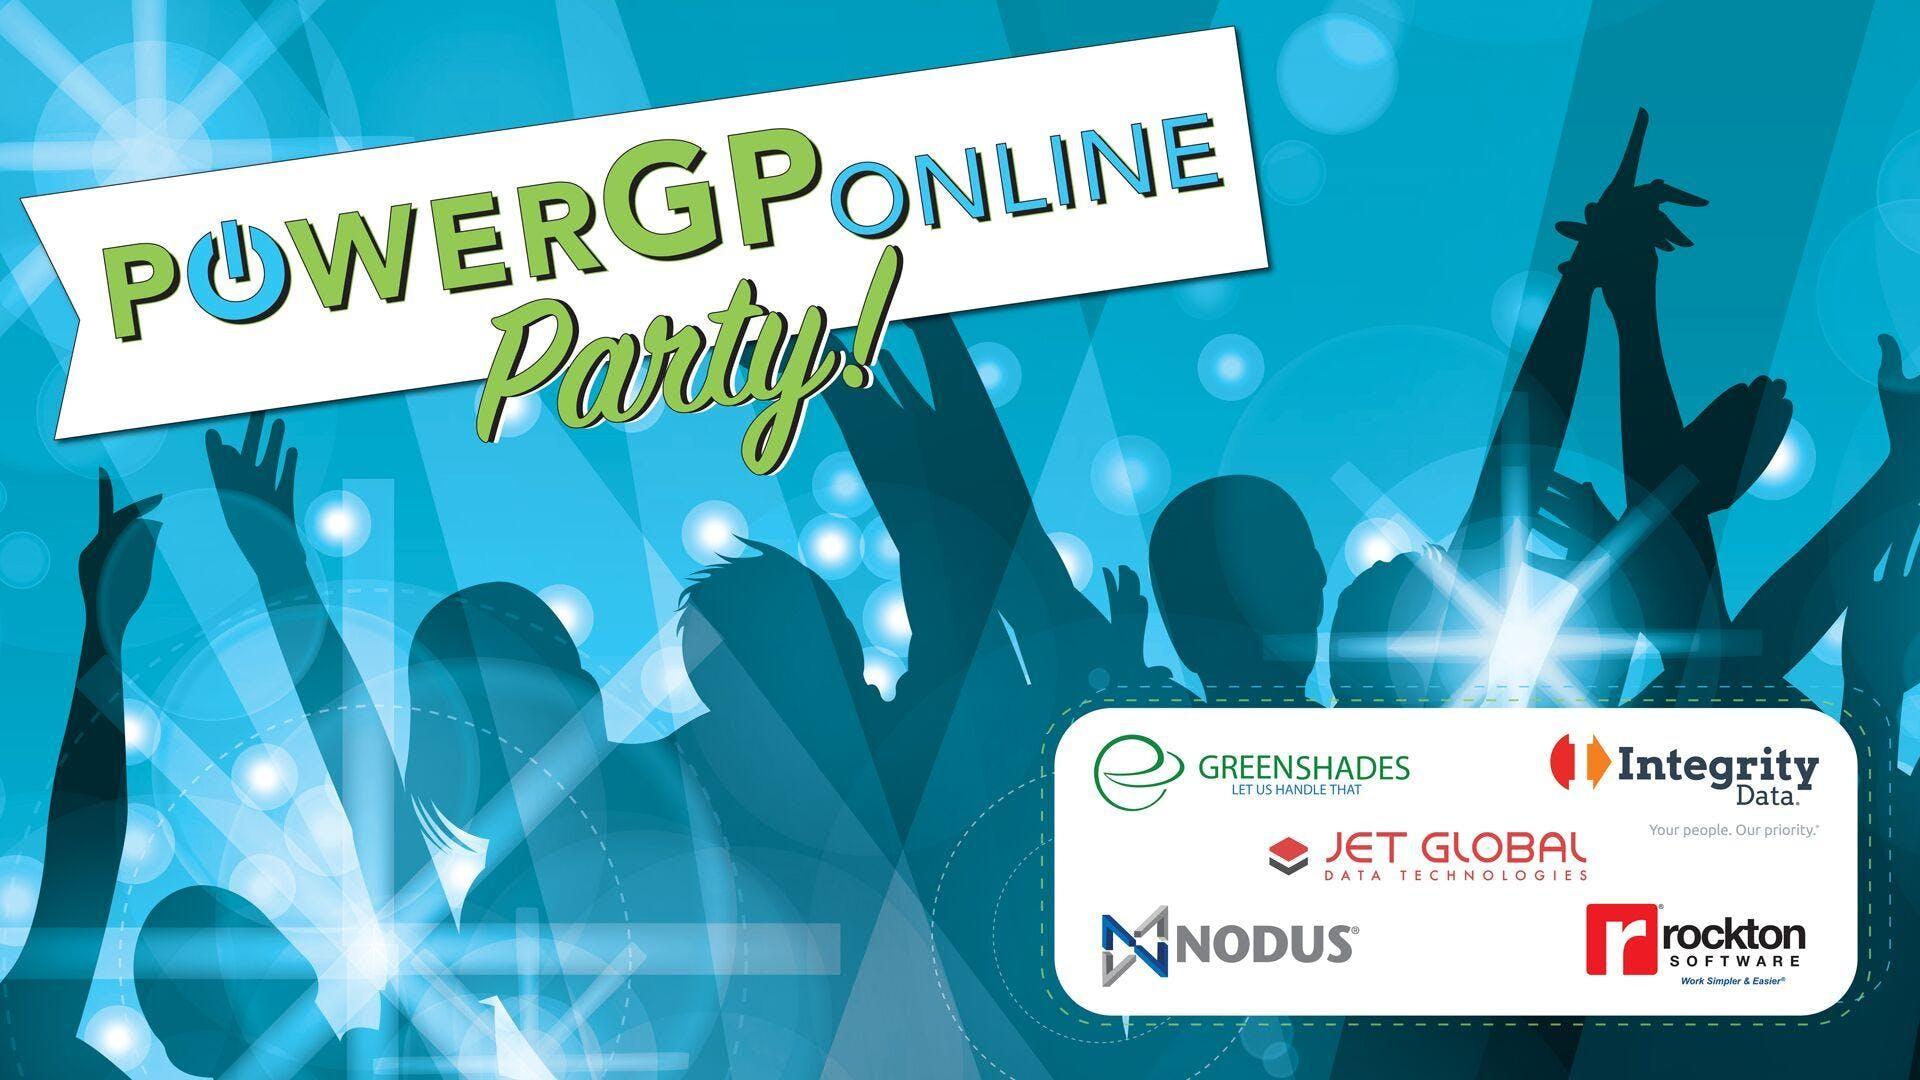 The PowerGP Online Party - Phoenix 2018